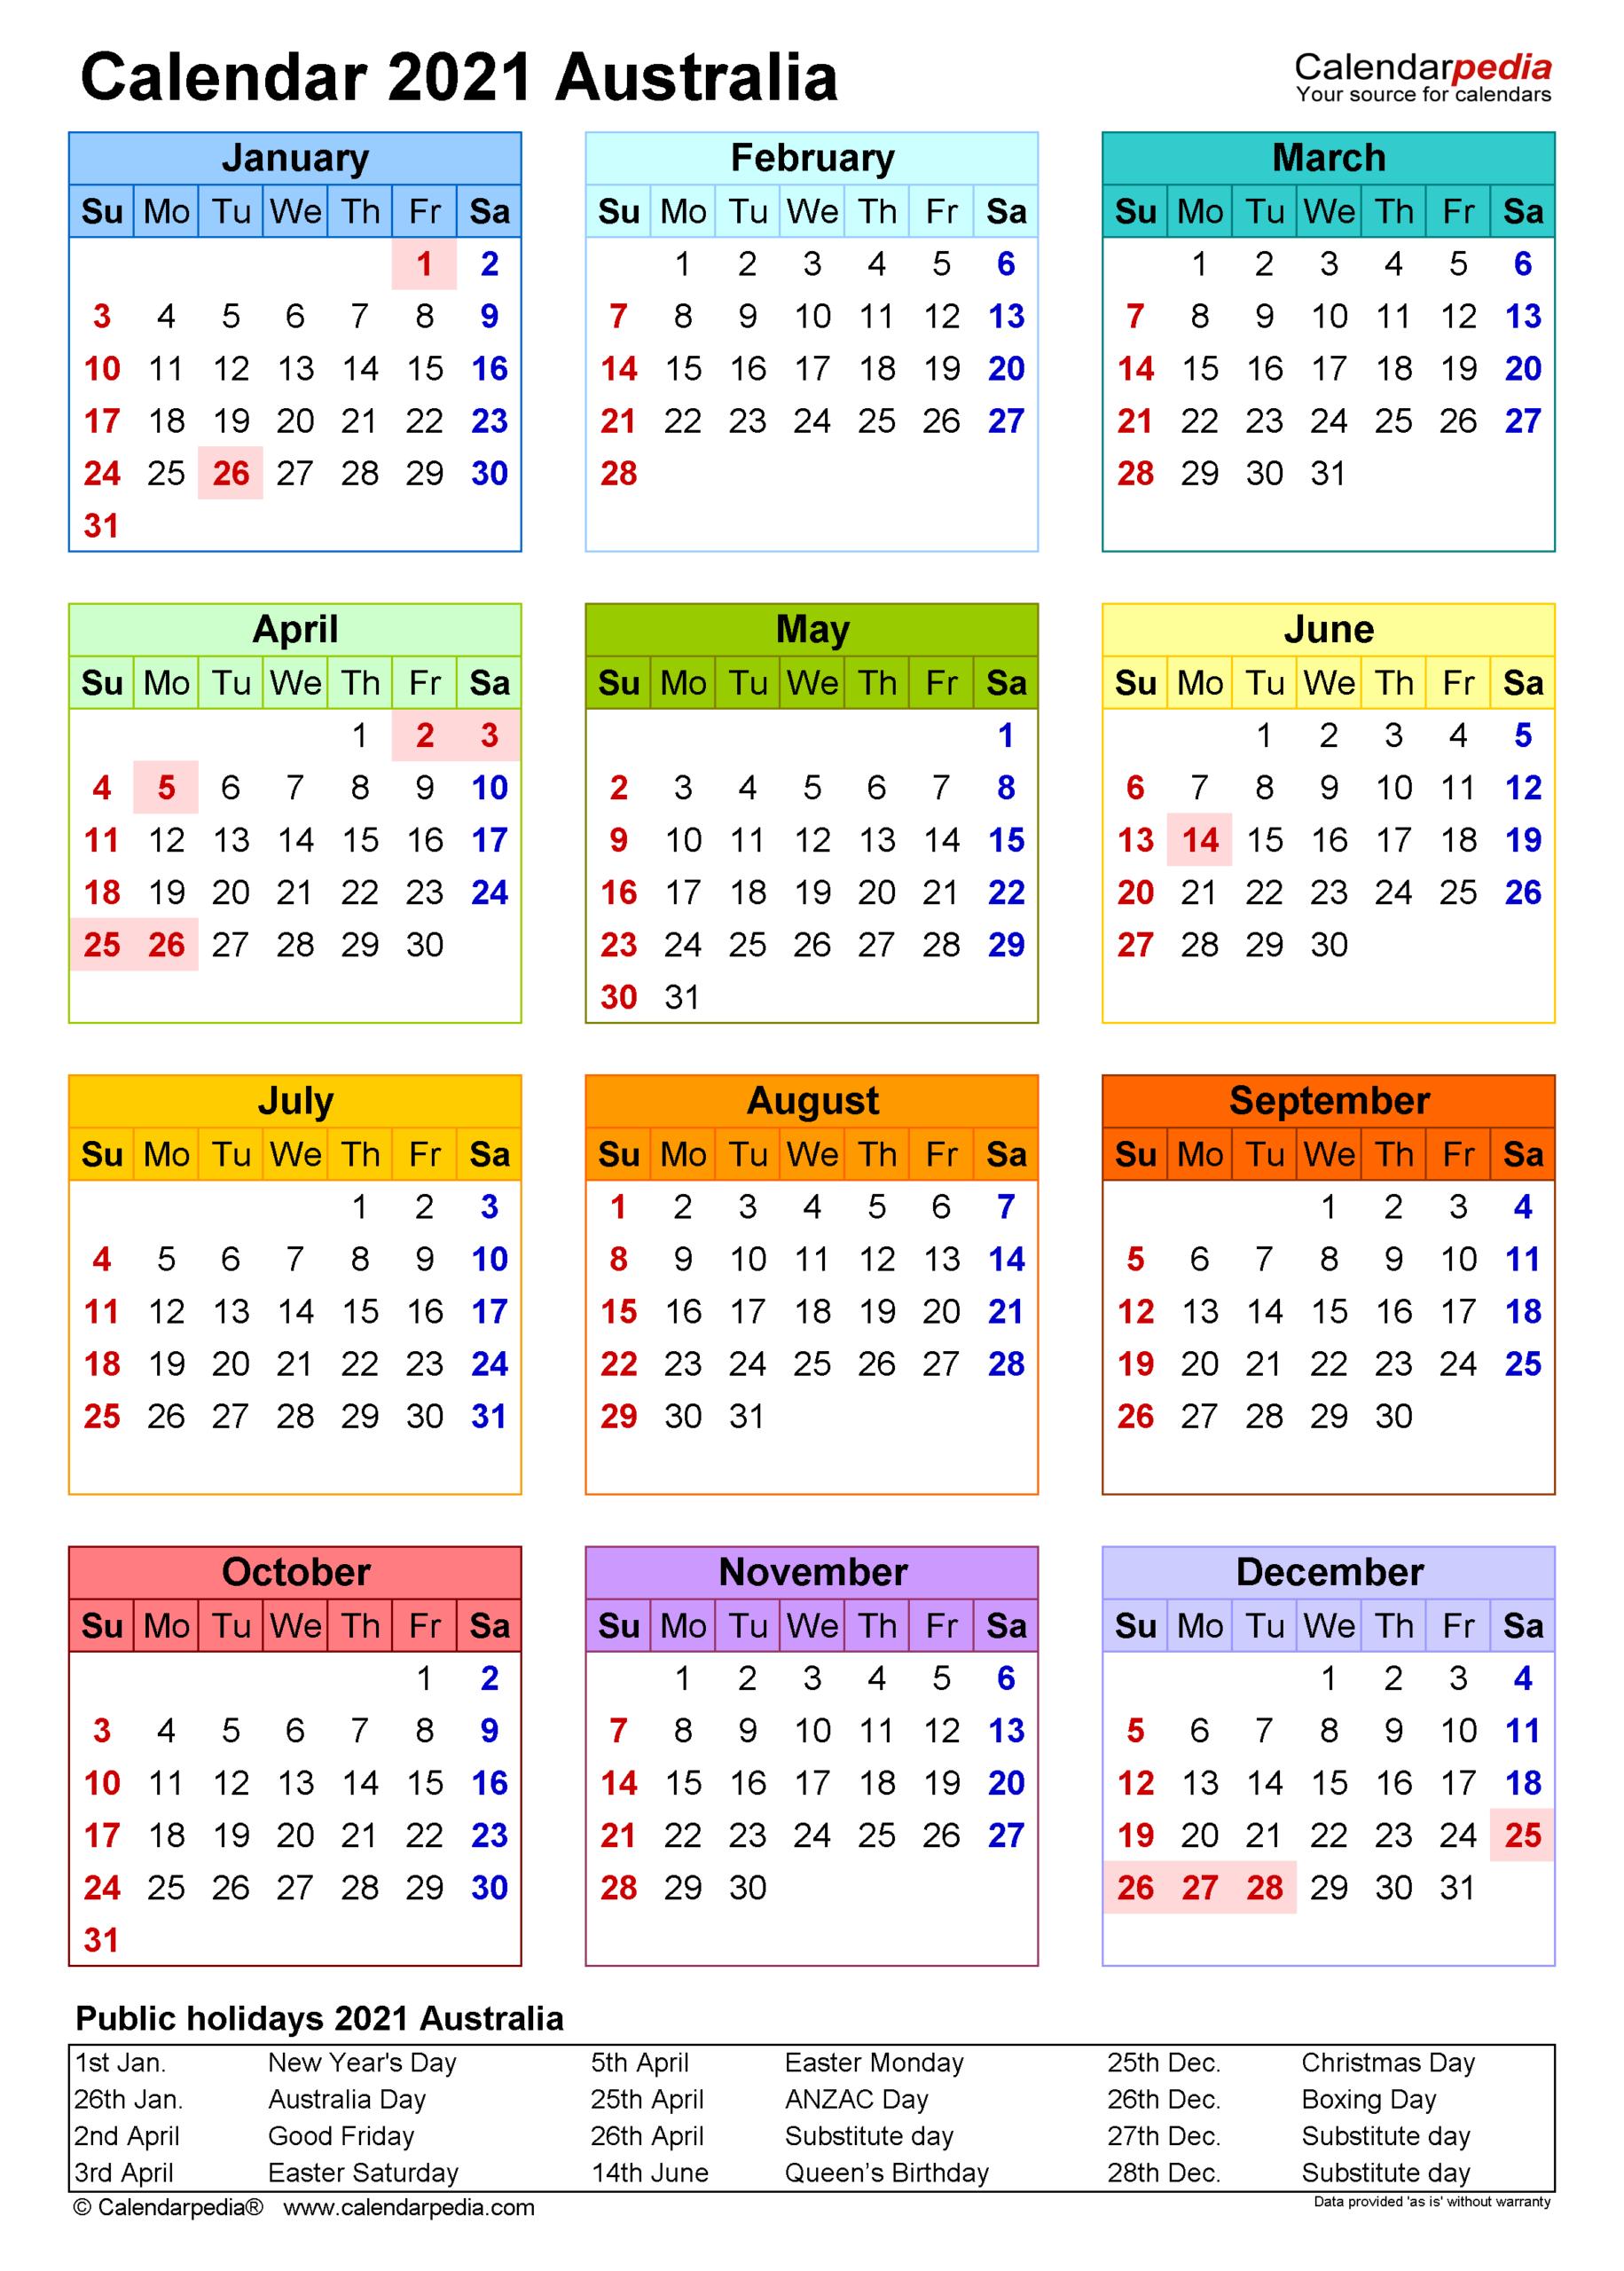 Australia Calendar 2021 - Free Printable Pdf Templates